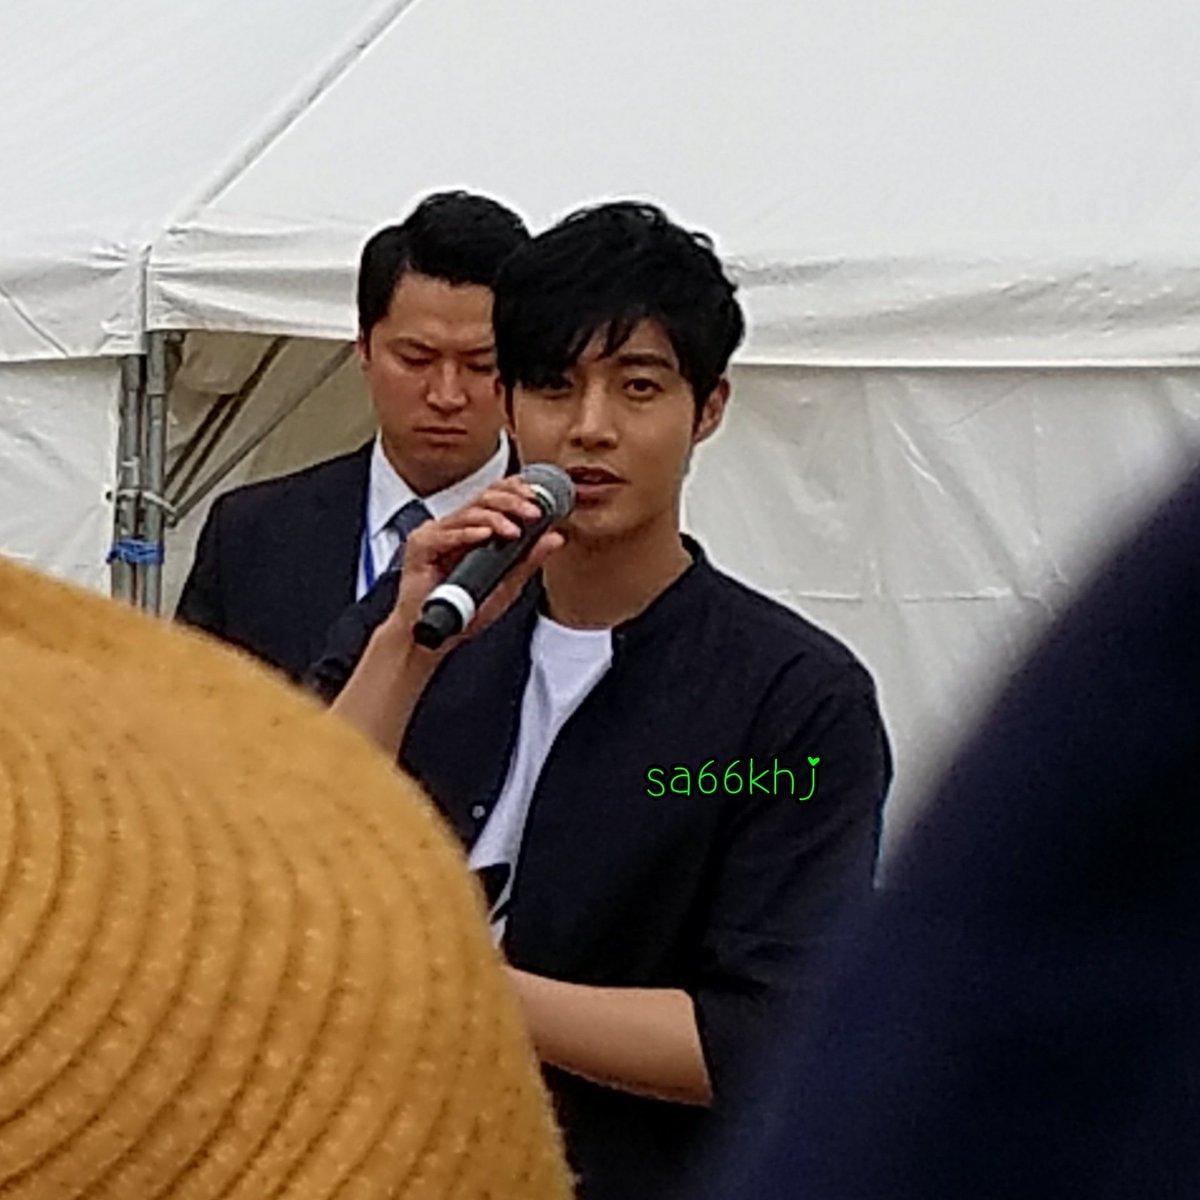 [Fancam] Rewind Handshake Event Osaka ~ Minato Machi River Place [2017.06.11]